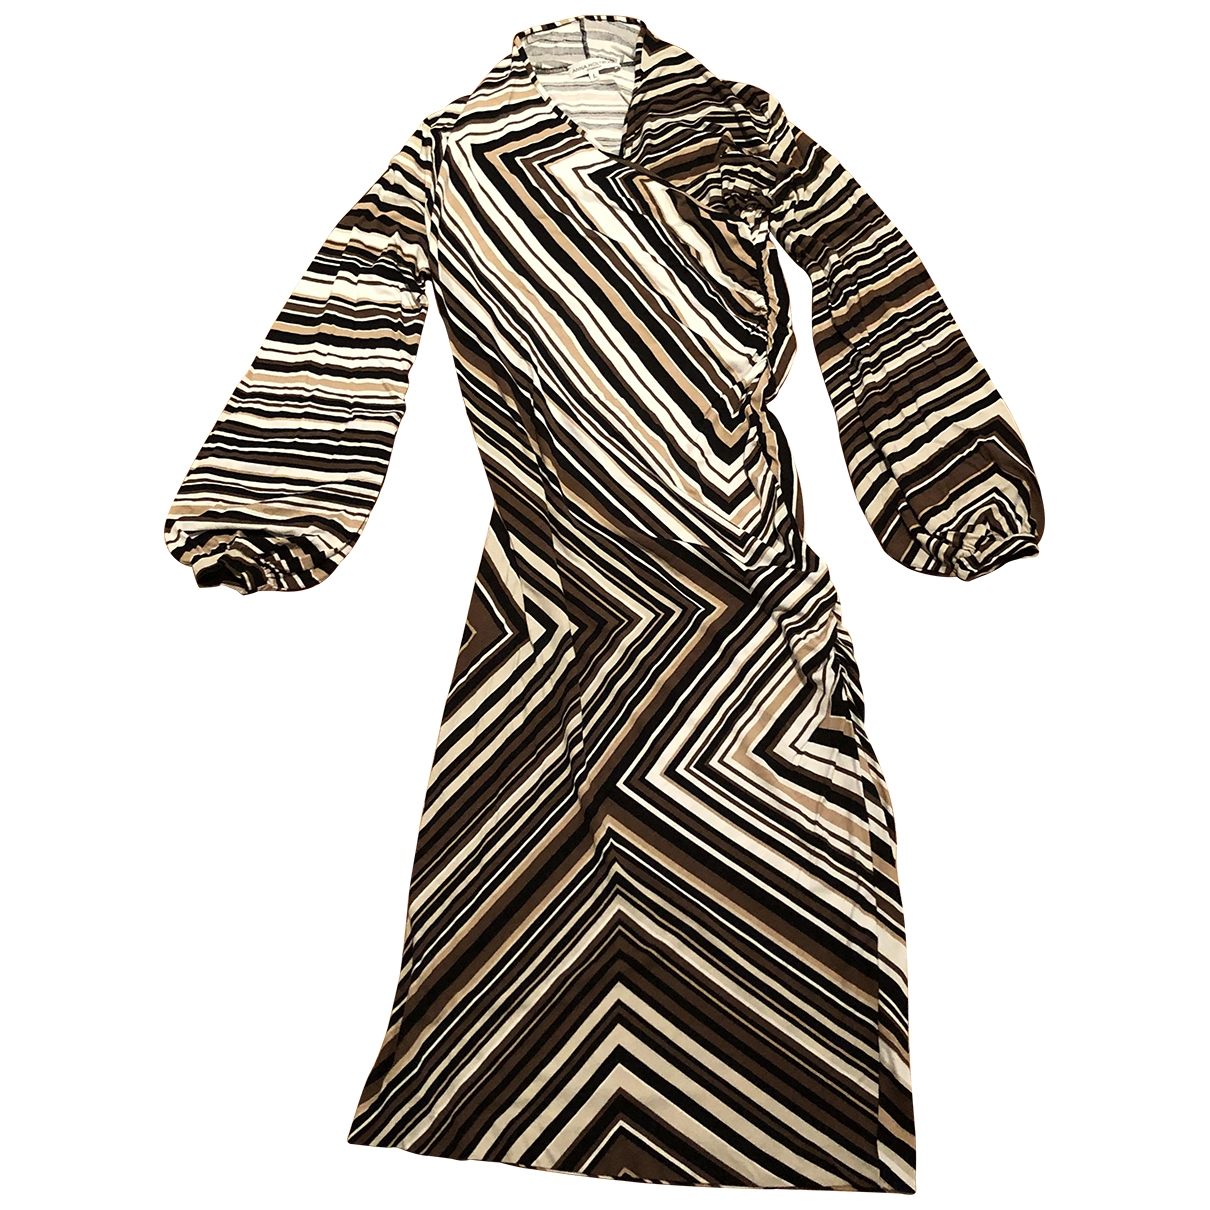 Non Signé / Unsigned \N Beige dress for Women L International